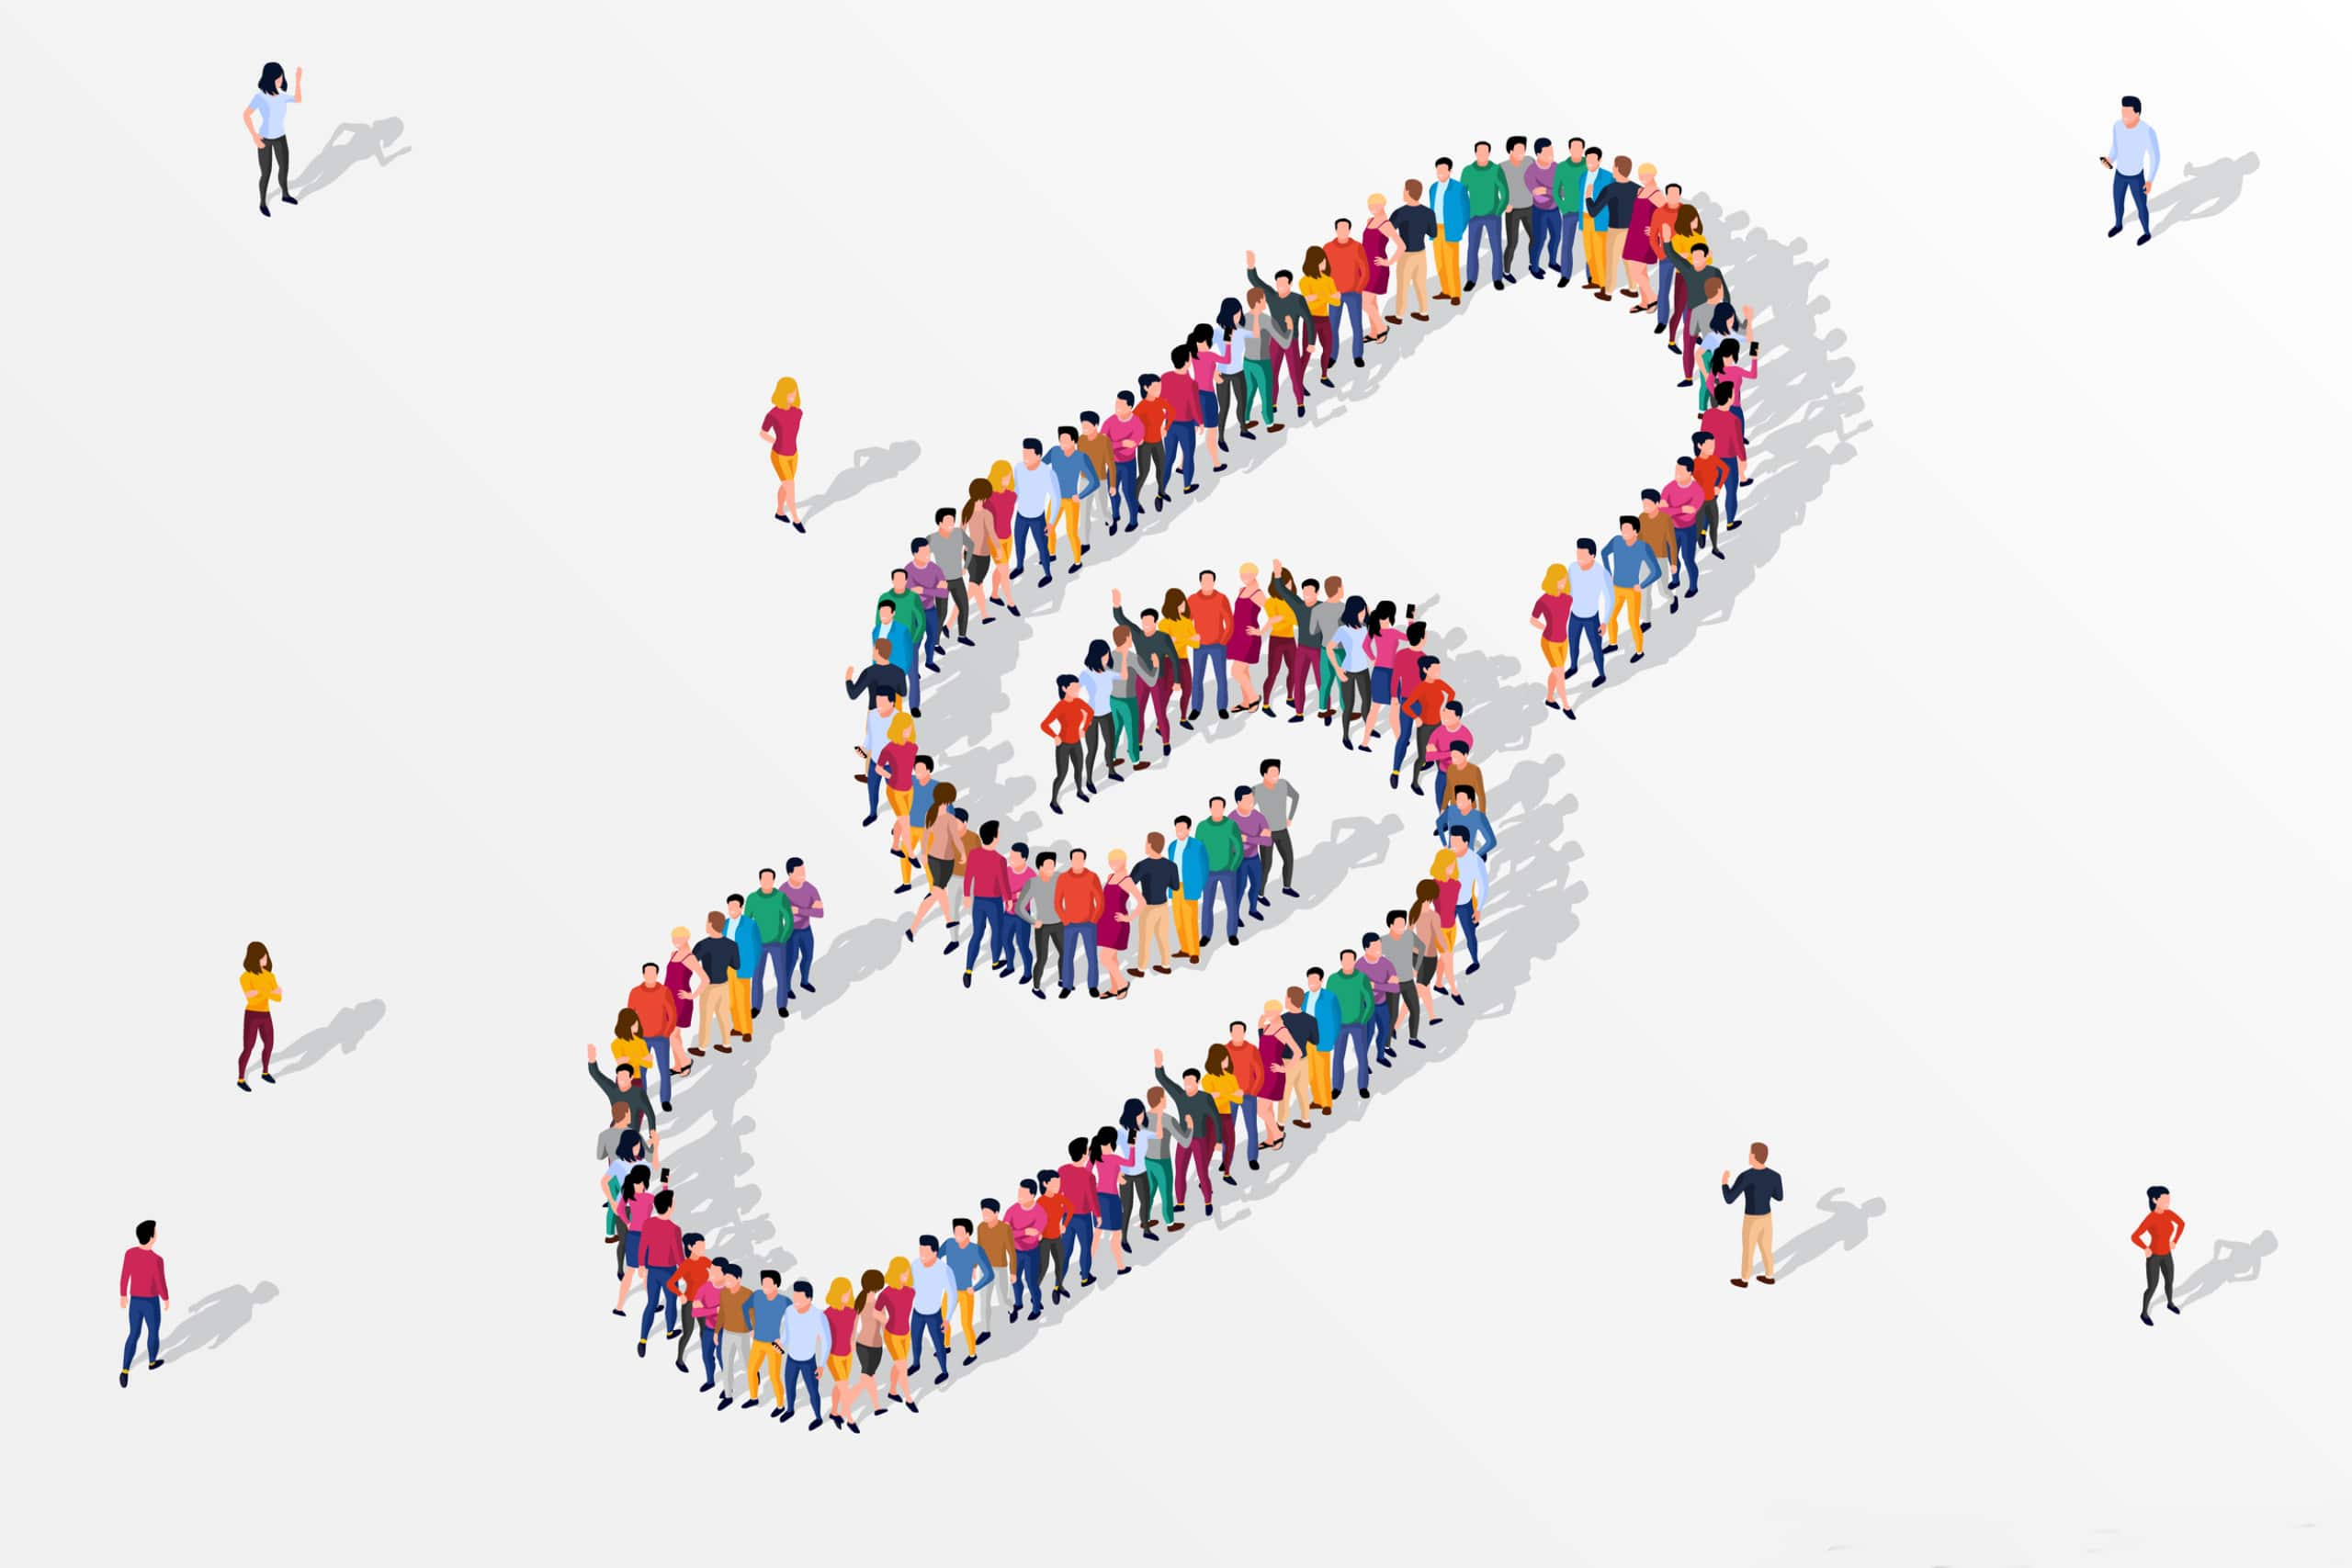 Dutch Cloud Group helpt de kleine ondernemer